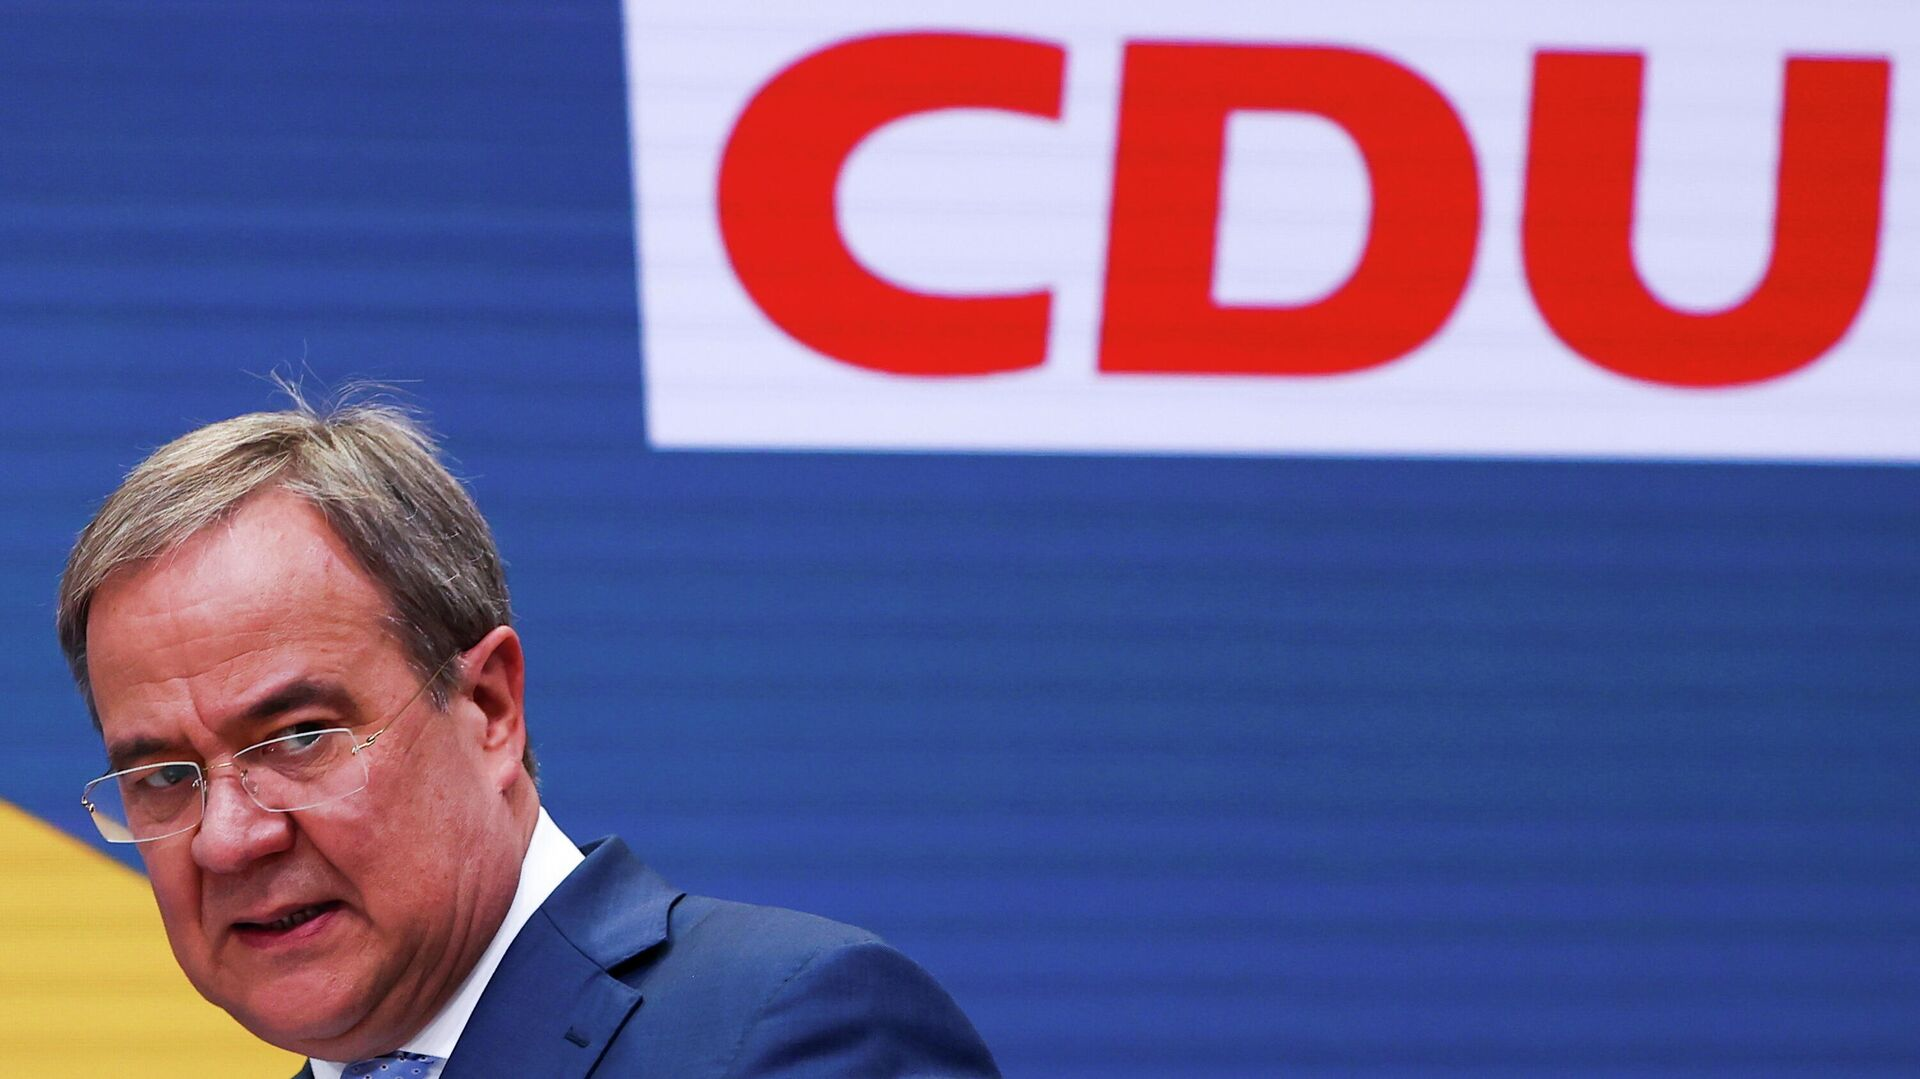 CDU-Chef Armin Laschet bei der Pressekonferenz am 27. September 2021 - SNA, 1920, 27.09.2021